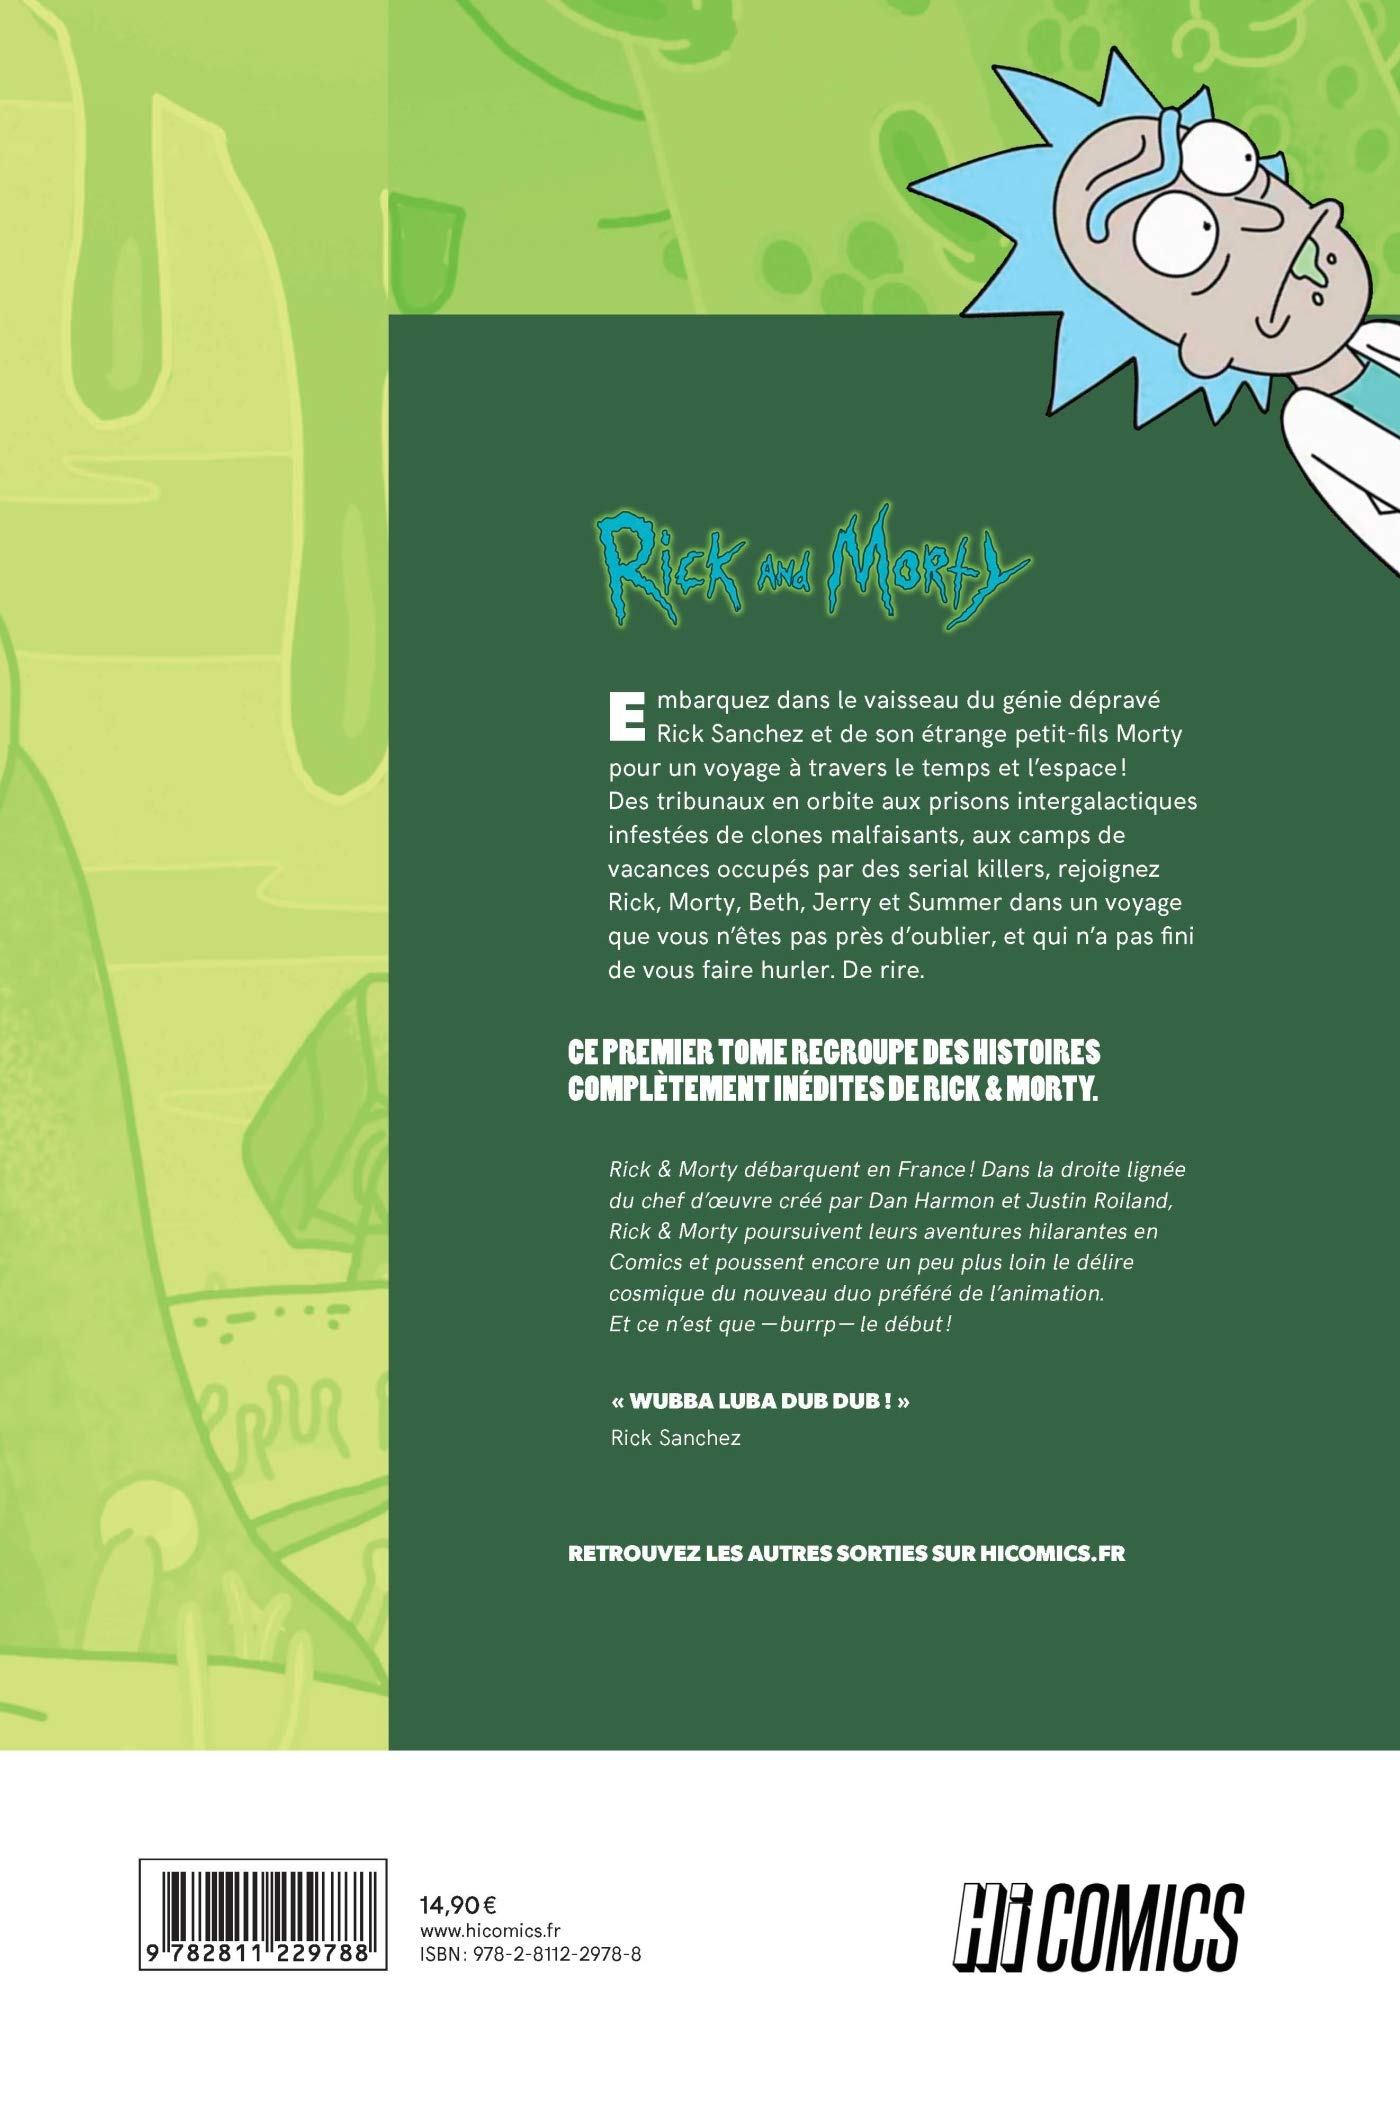 Rick and Morty, T1 (HiComics): Amazon.es: Gorman, Zac, Cannon, C. J.: Libros en idiomas extranjeros